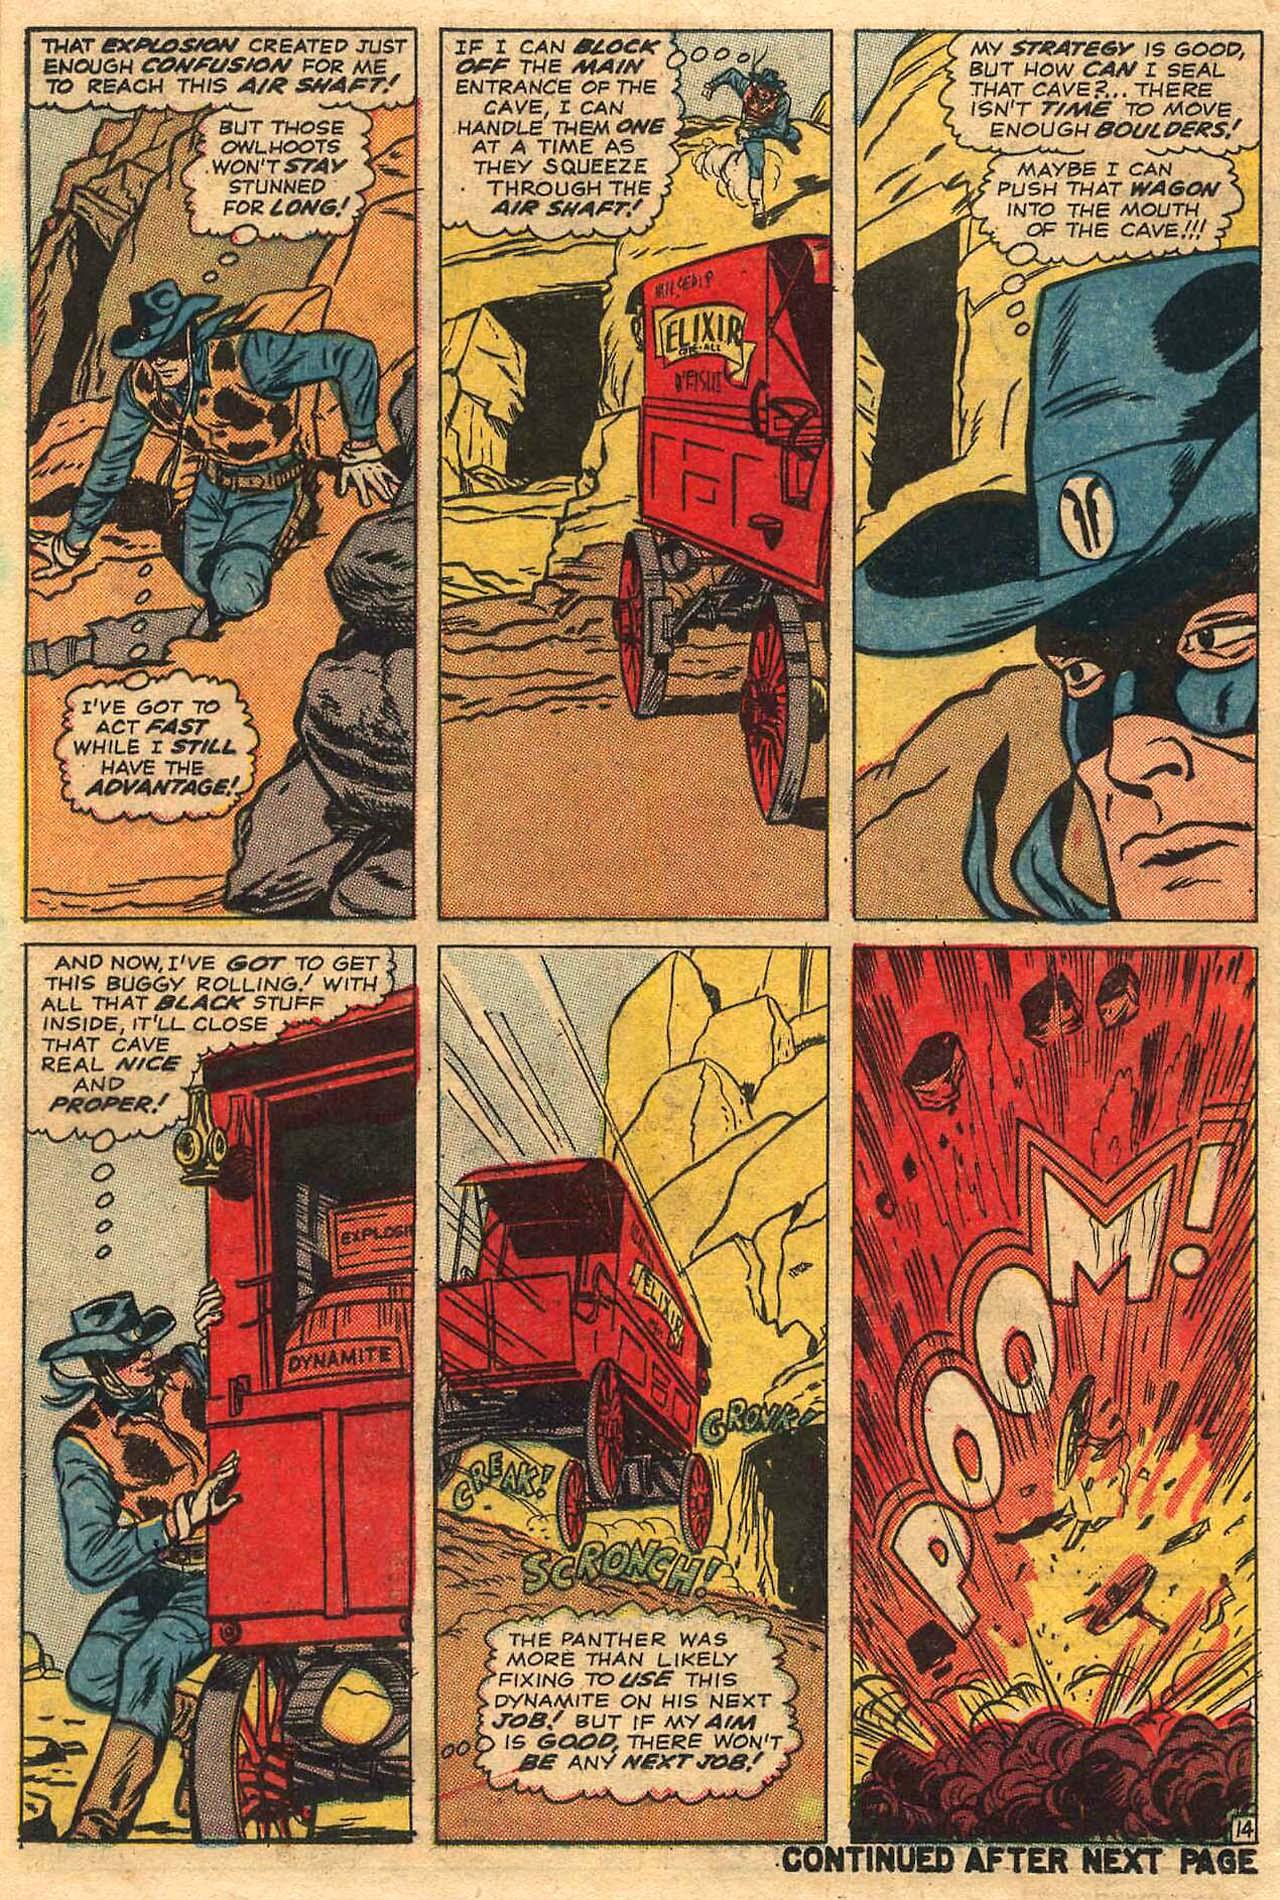 Read online Two-Gun Kid comic -  Issue #77 - 18